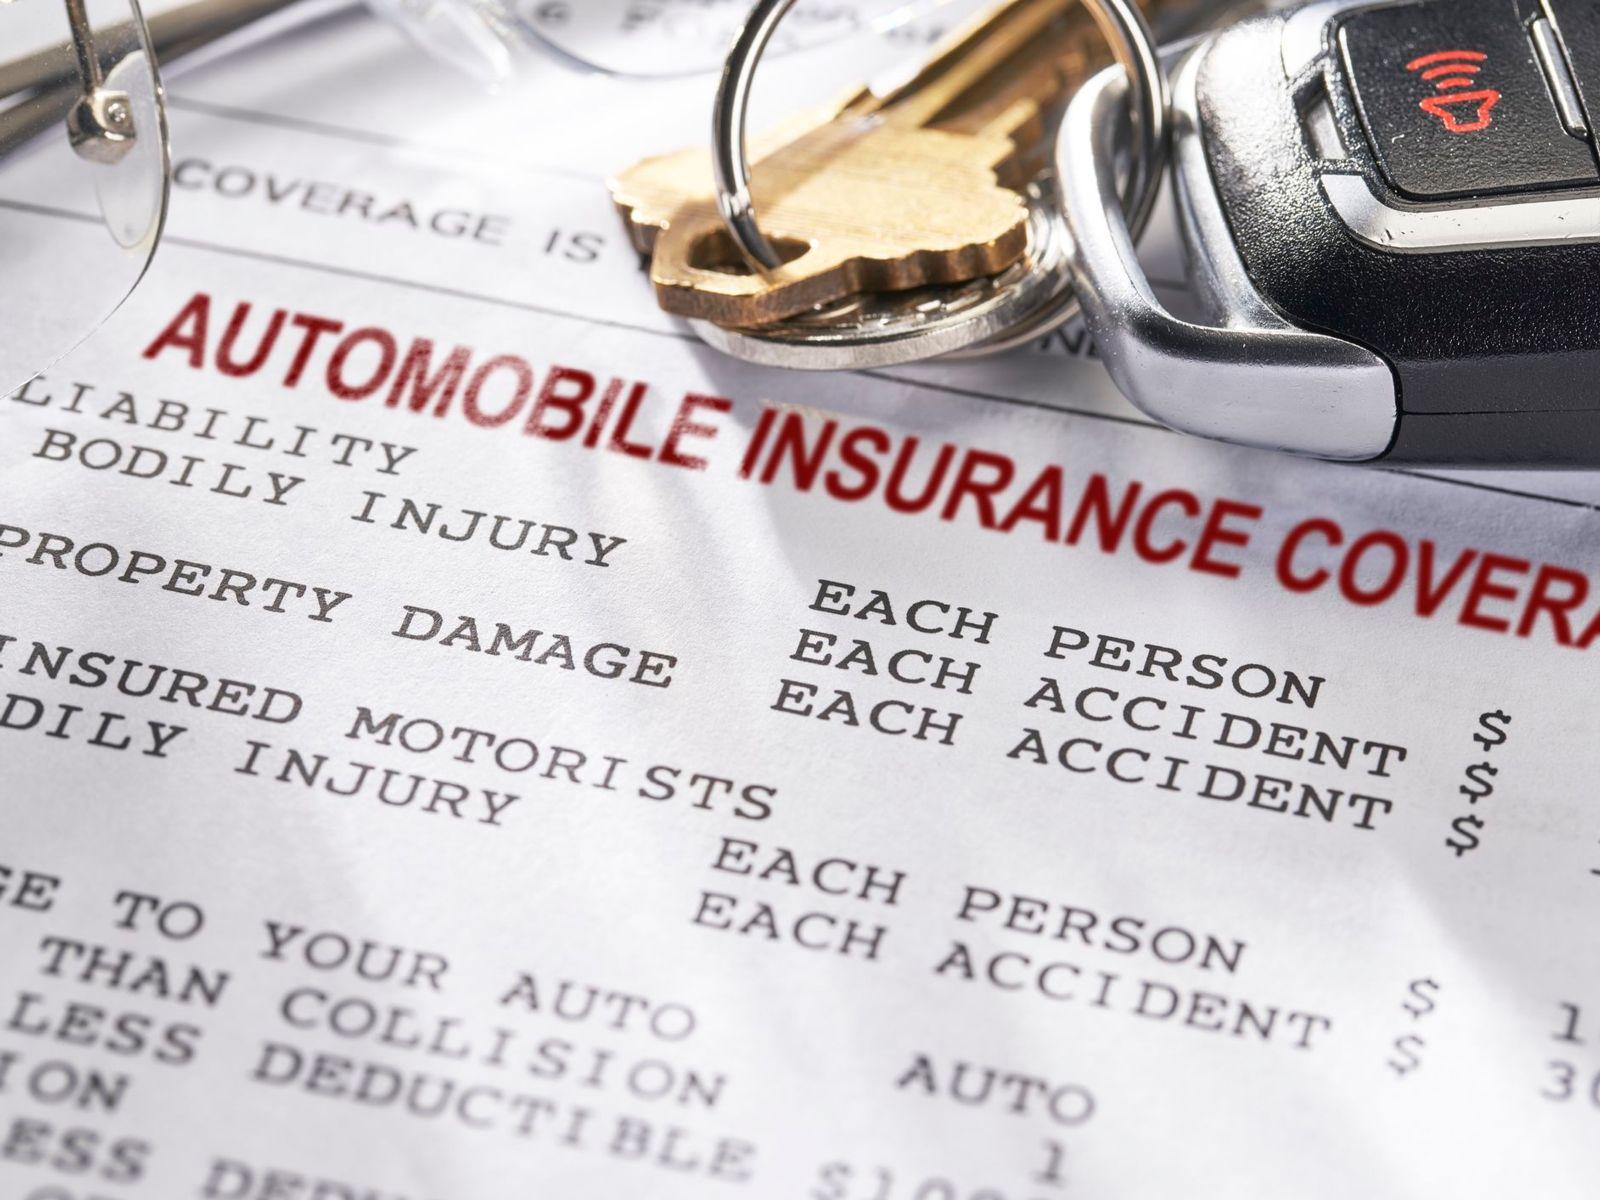 Auto Insurance Decepitive Policy Matthew Konecky PA Criminal Defense Personal Injury in Palm Beach County Florida